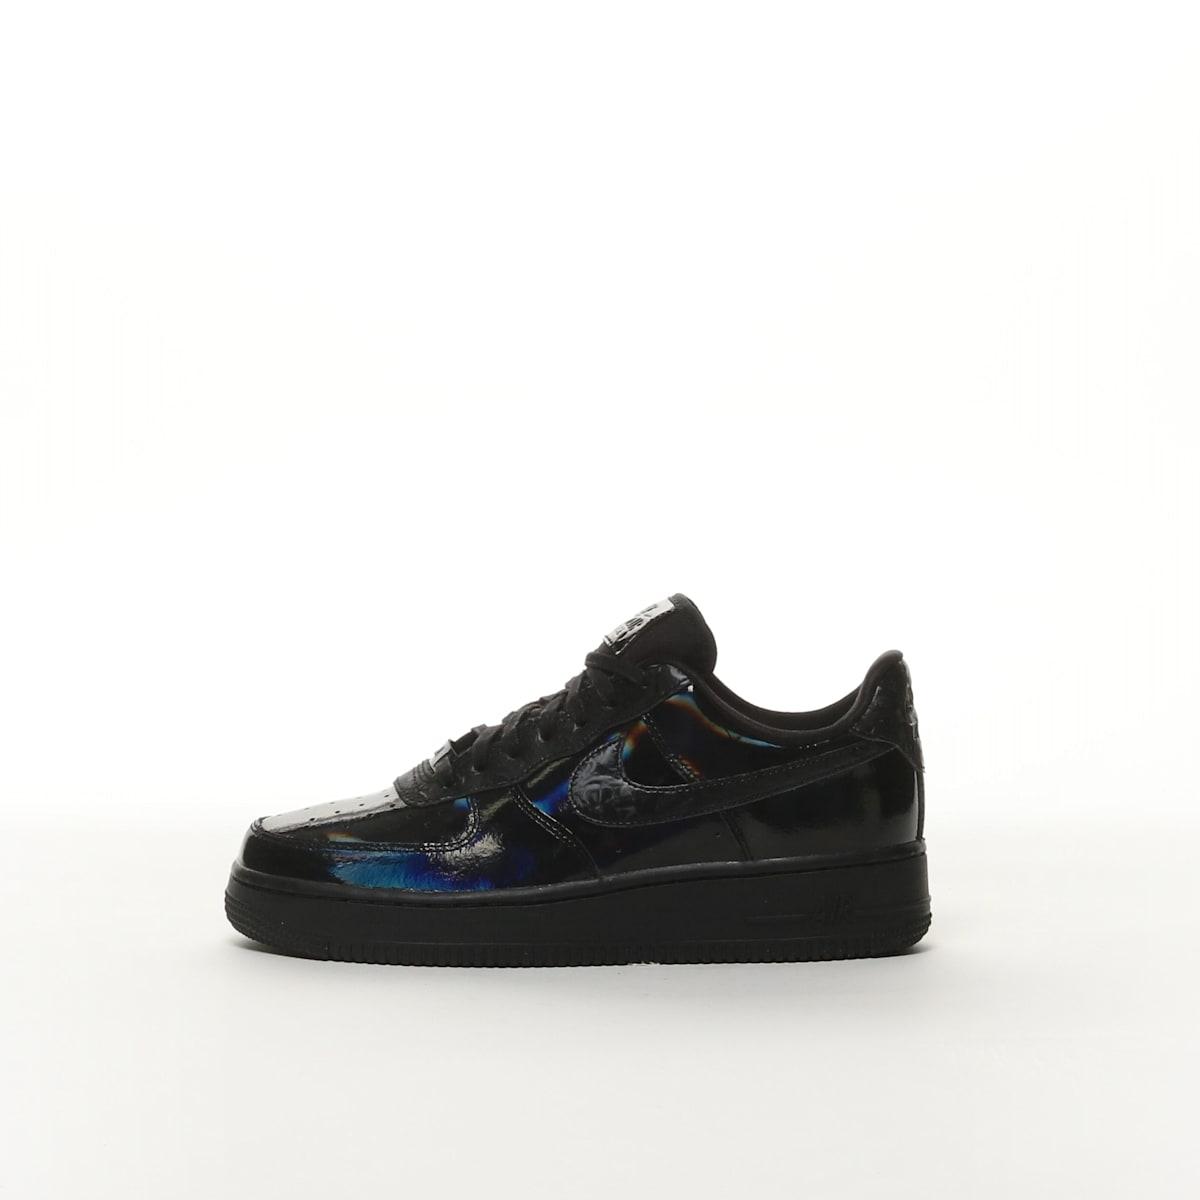 premium selection a7047 e8033 Women's Nike Air Force 1 '07 Lux Shoe - BLACK/BLACK-SUMMIT WHITE – Resku